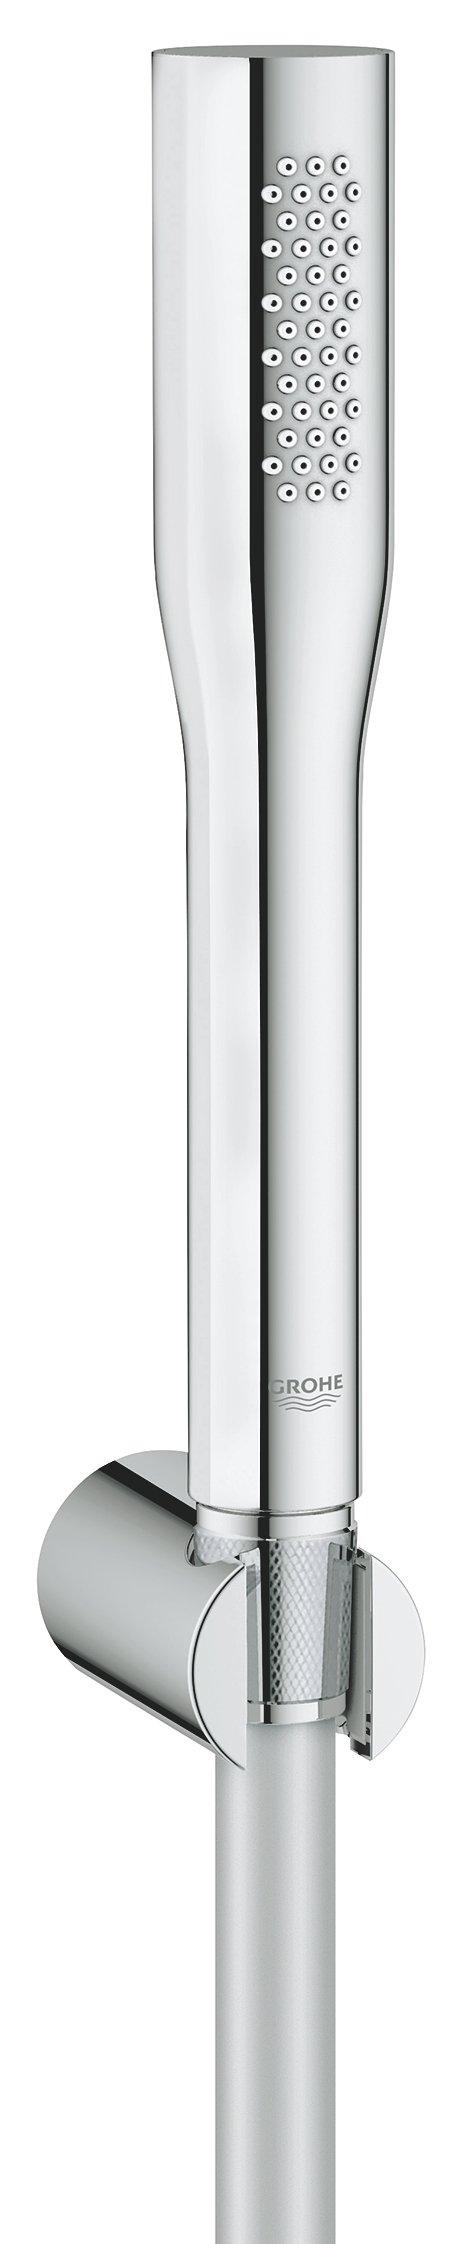 Grohe Euphoria Cosmopolitan Stick doucheset 1 straal, chroom